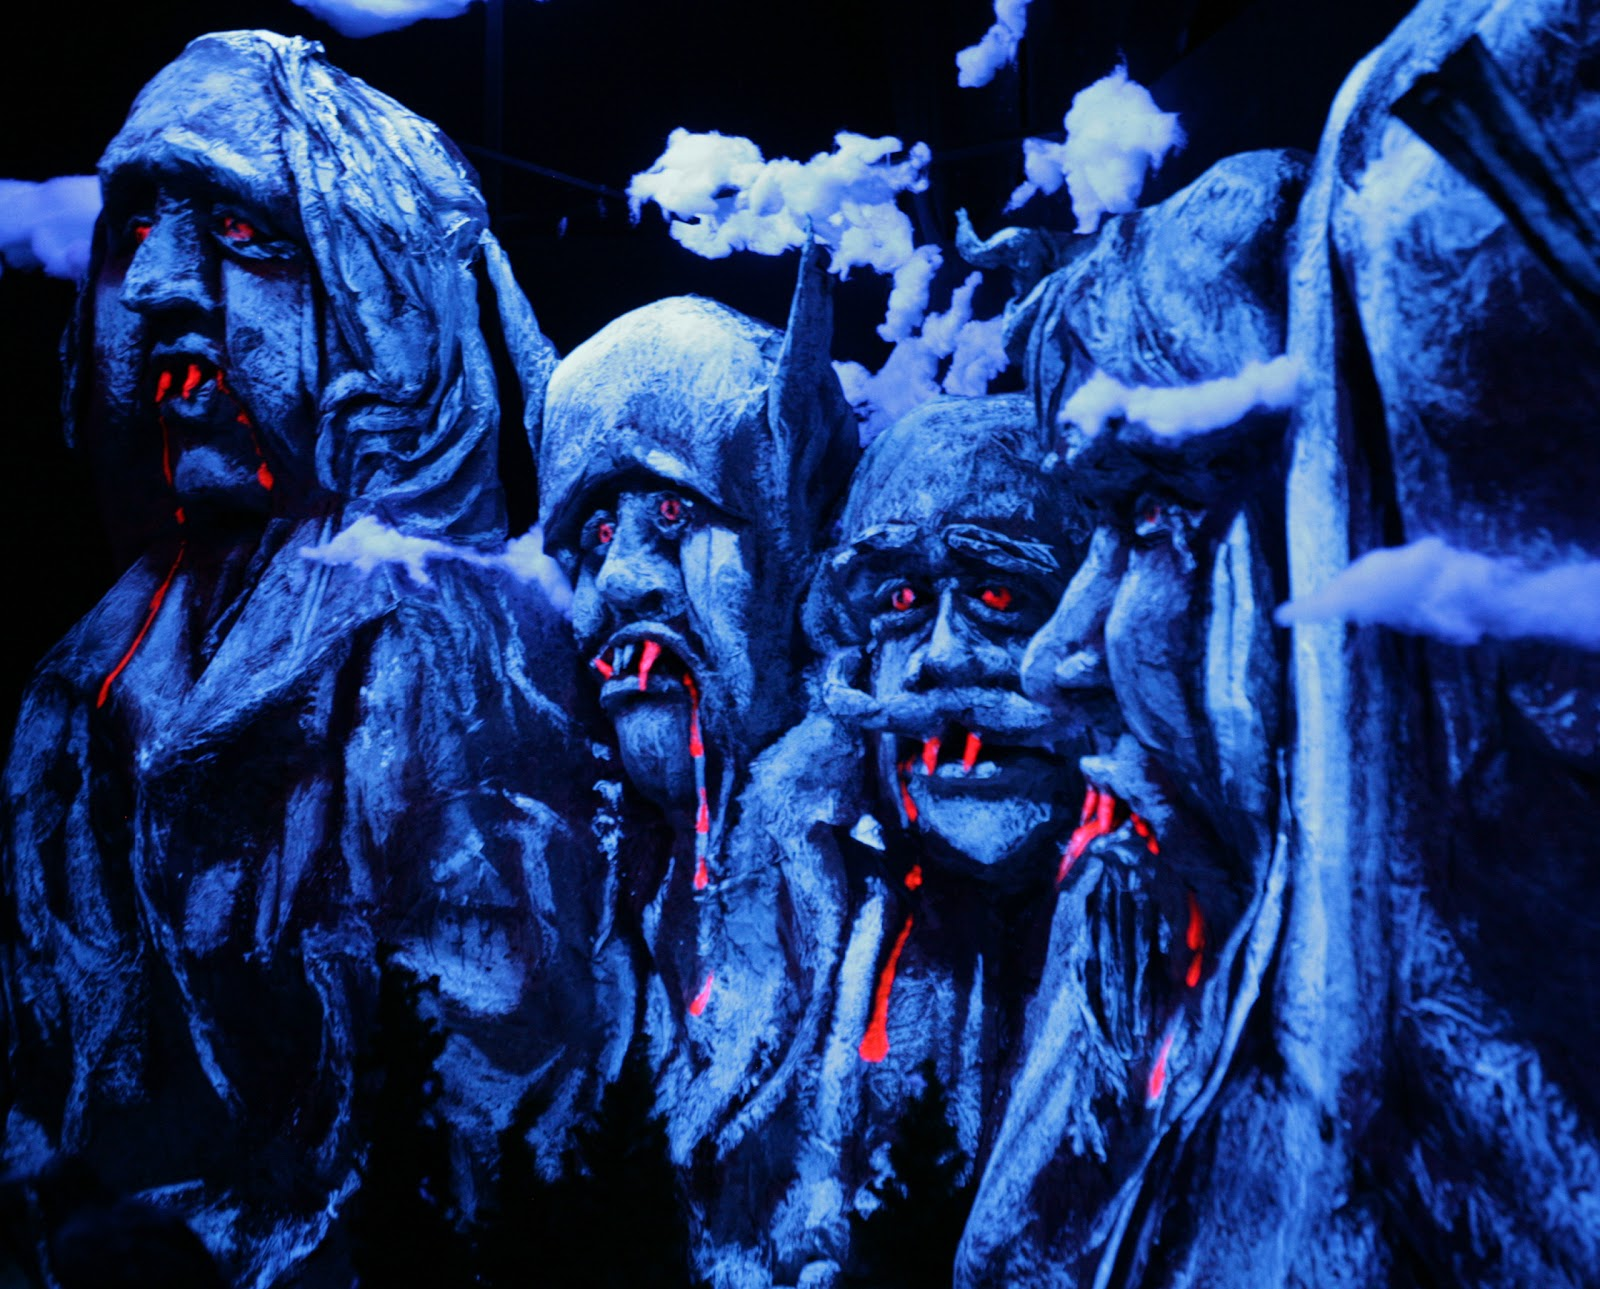 http://3.bp.blogspot.com/-GfDYCaxqFOA/TpmavUKOSpI/AAAAAAAABH0/Rp9745pD5z8/s1600/HauntedHouse_CountRushmore.jpg